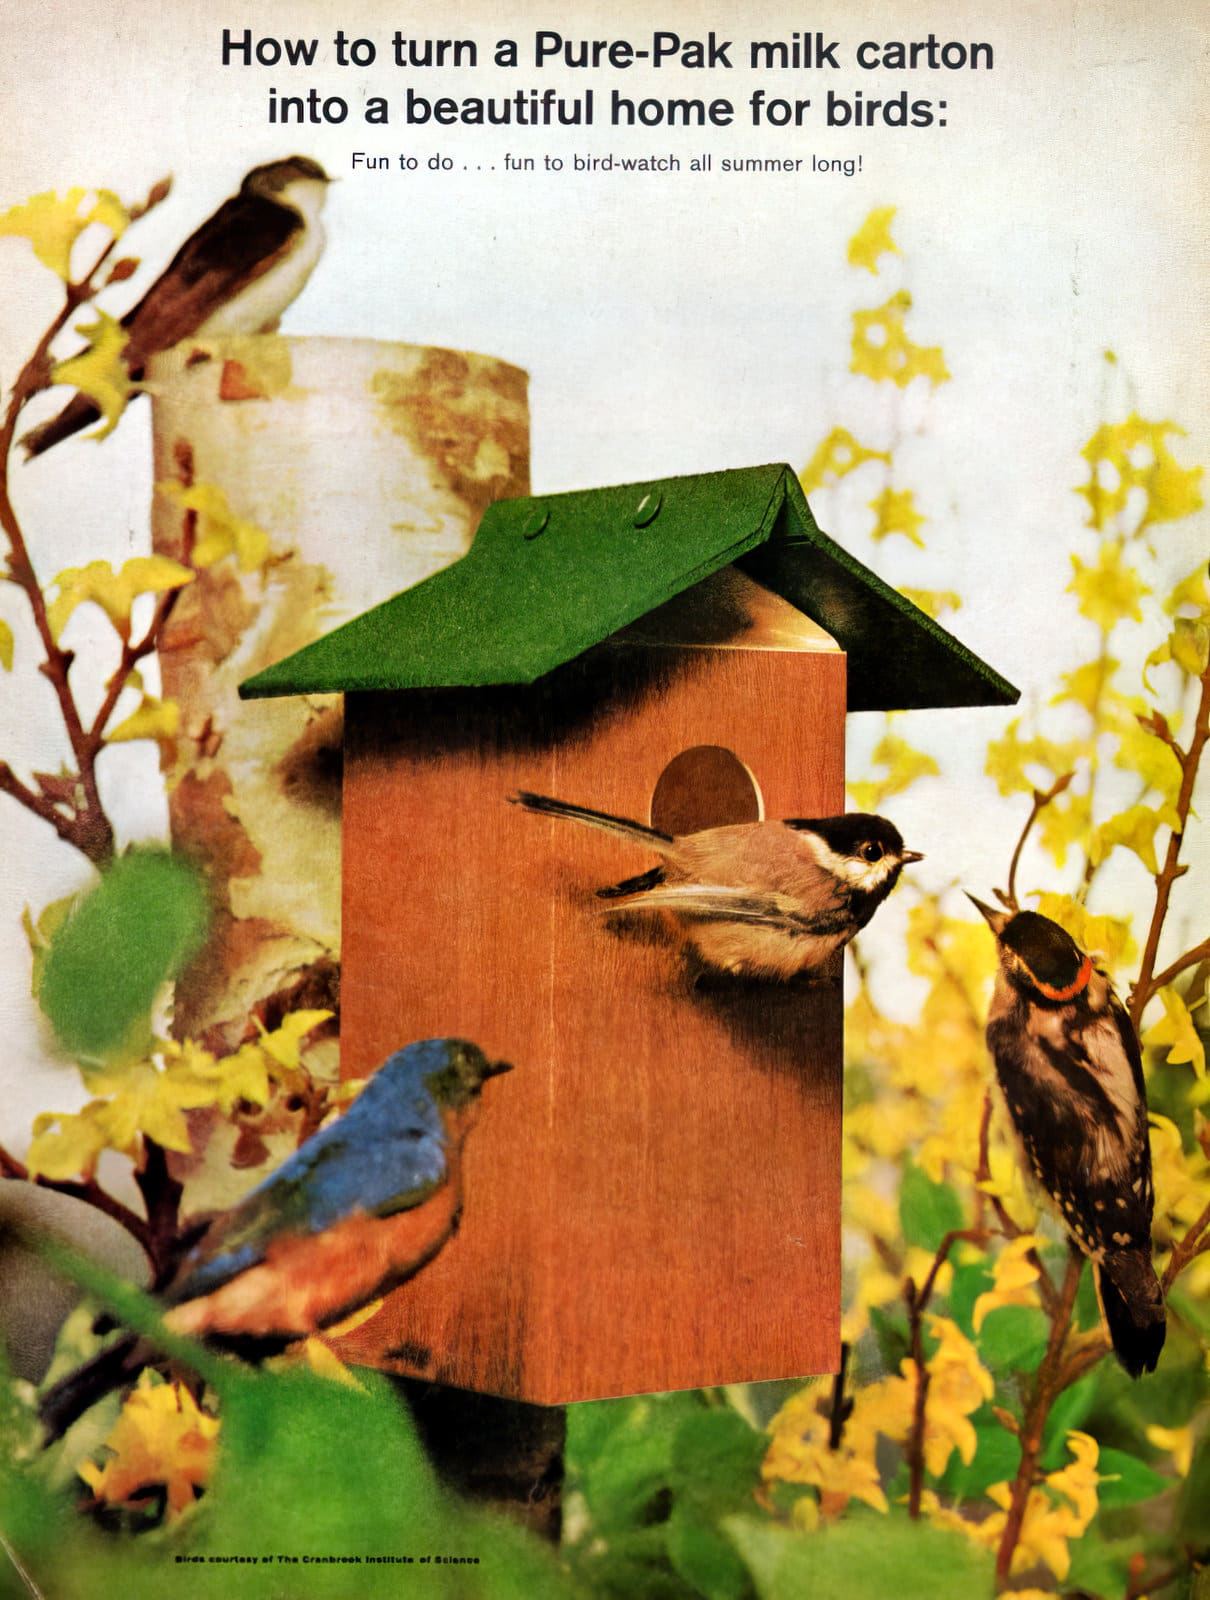 How to make a milk carton bird house the retro way